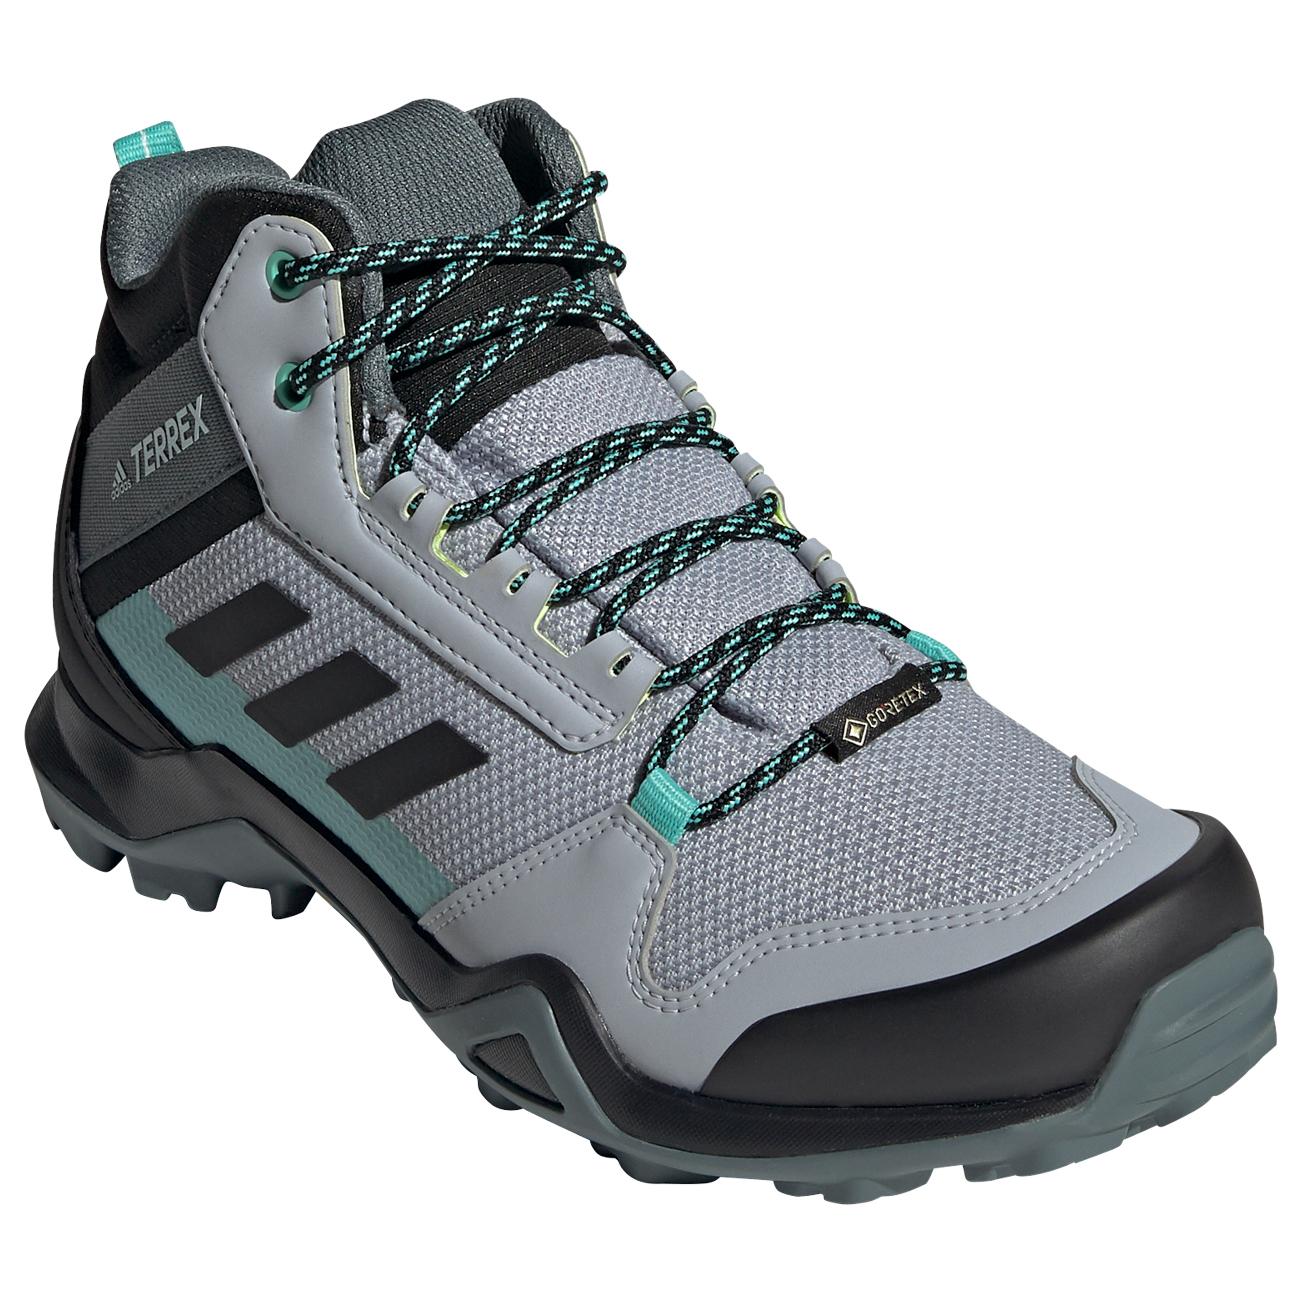 adidas - Women's Terrex AX3 Mid GTX - Chaussures de randonnée - Core Black / Dgh Solid Grey / Purple Tint | 4 (UK)